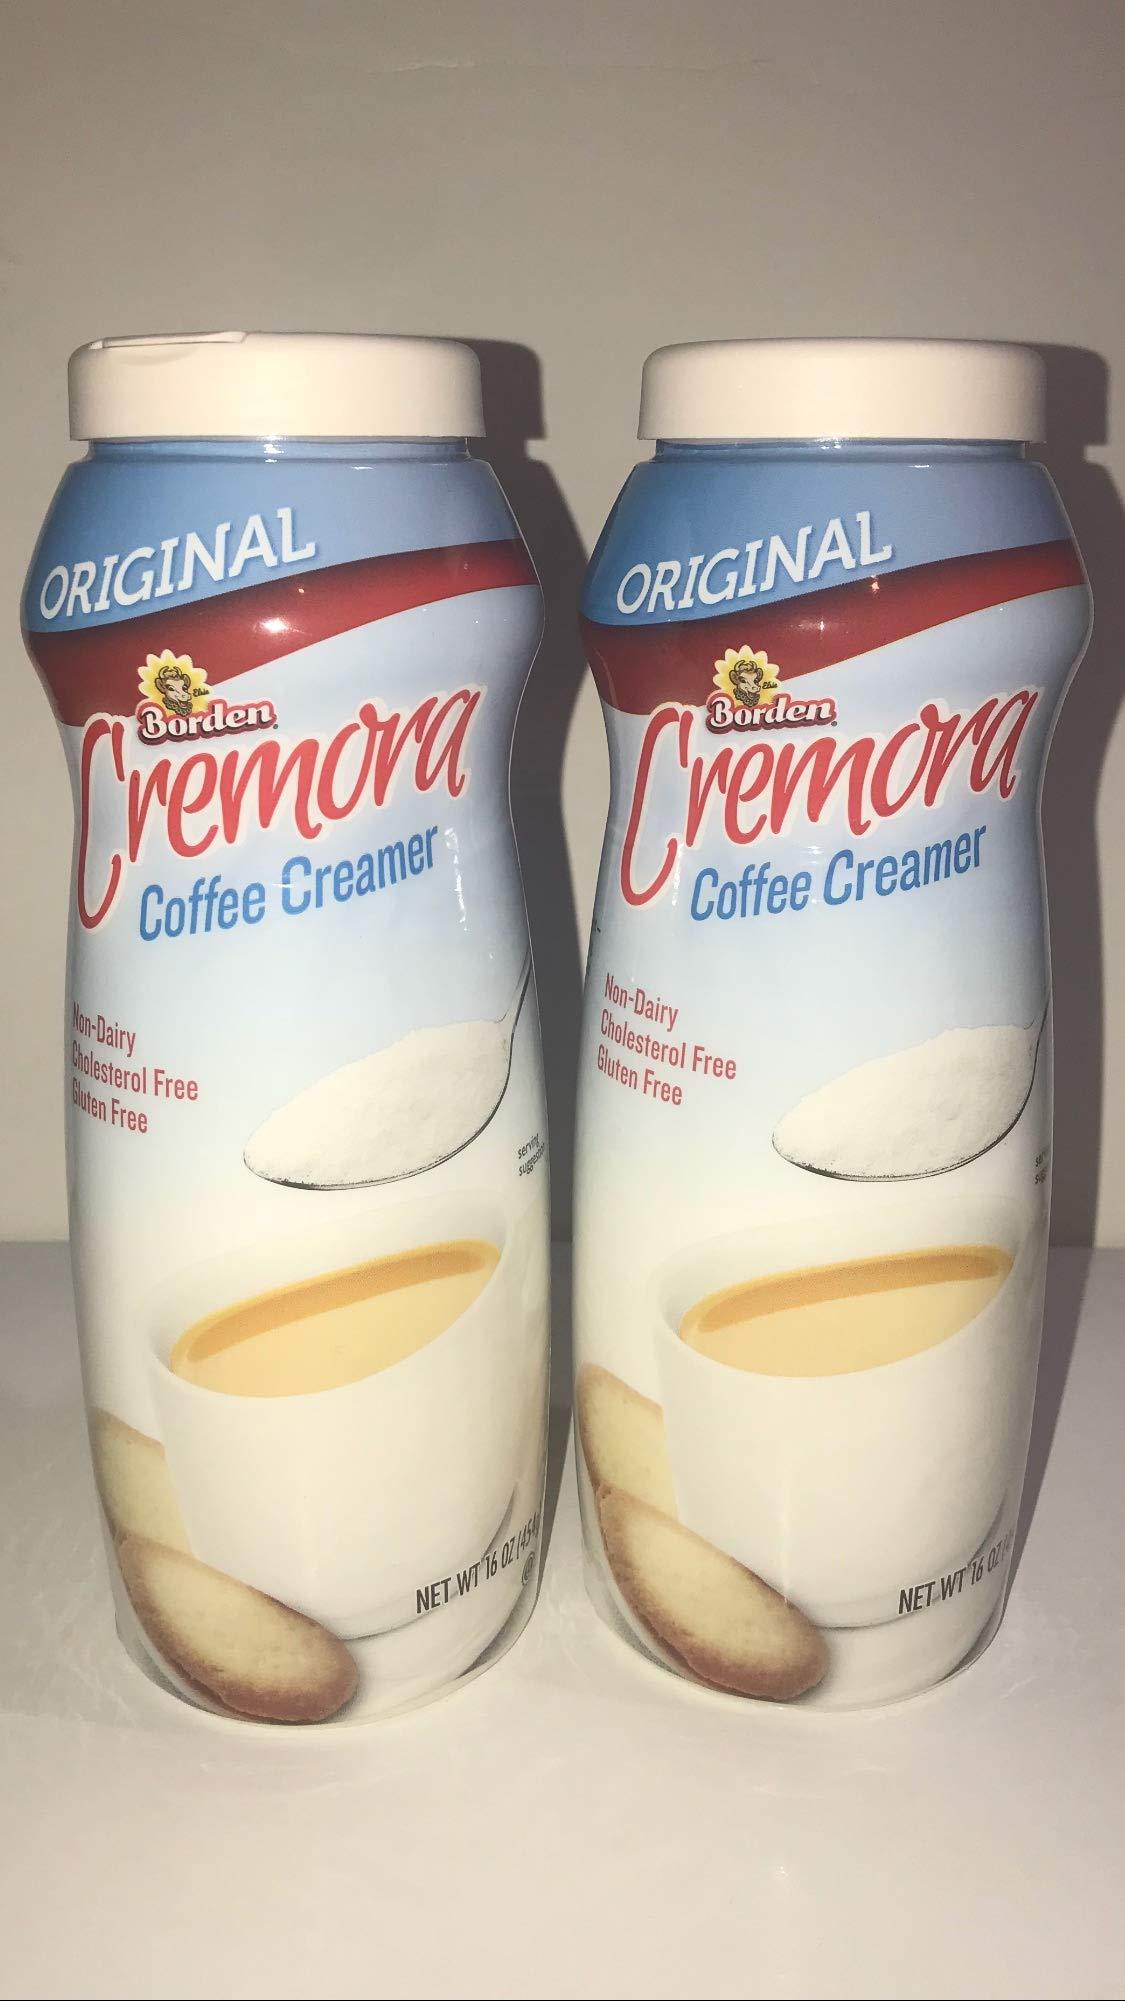 Borden Cremora Non- Dairy Powdered Coffee Creamer Original,16 oz bottle (Pack of 2)